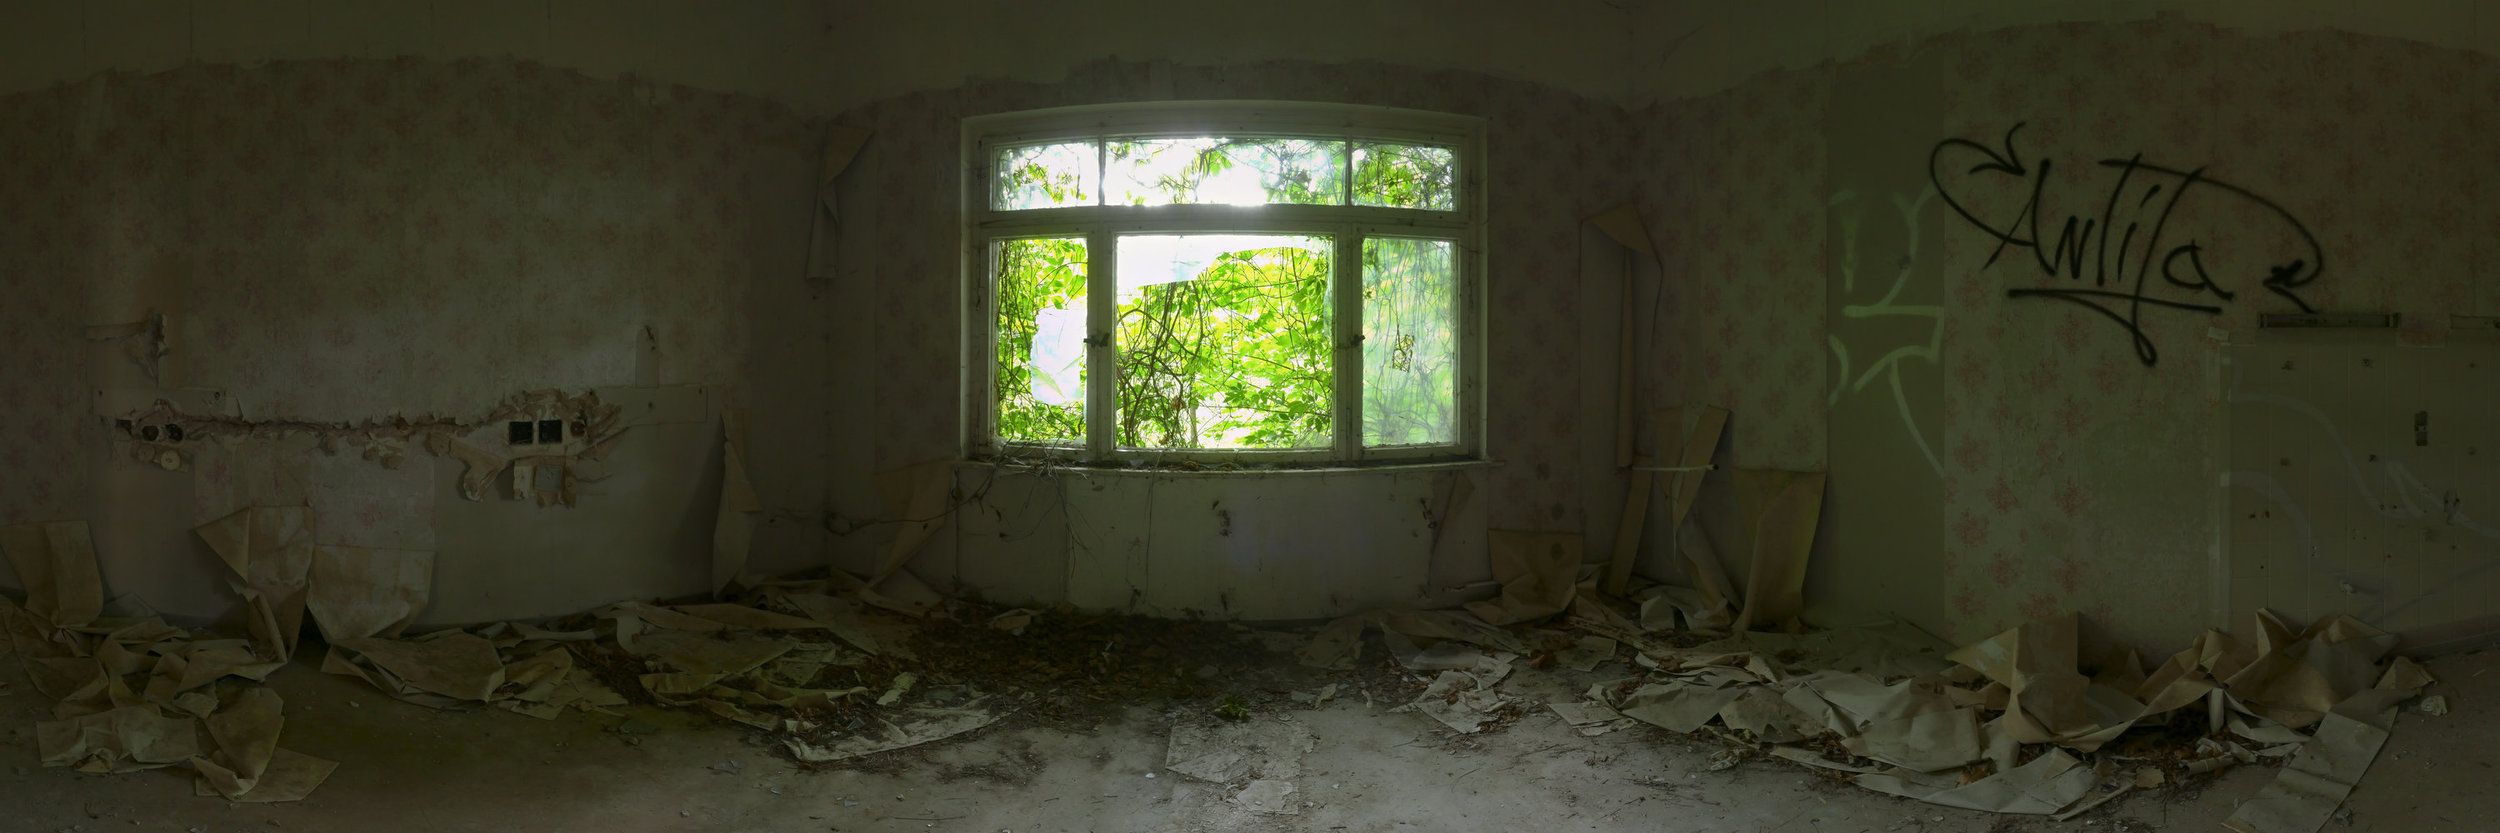 grünes Patientenzimmer